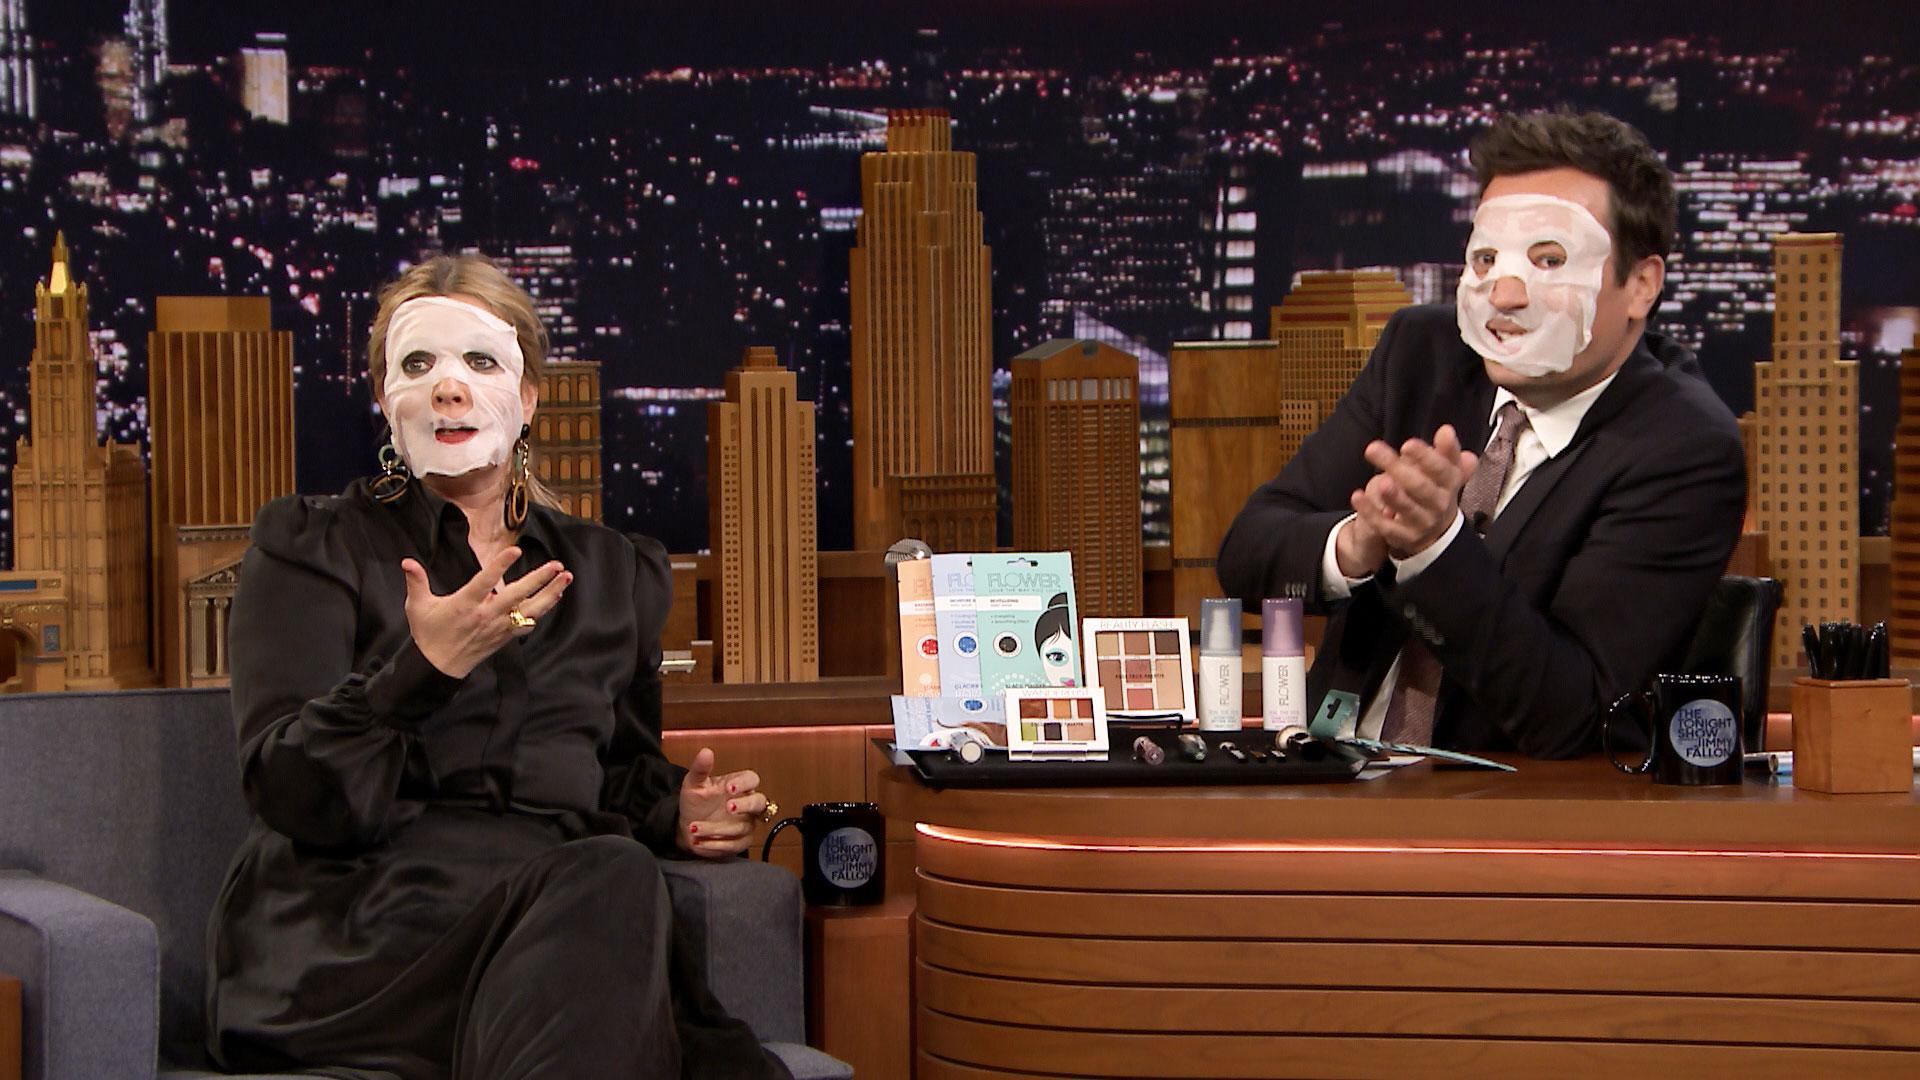 Watch The Tonight Show Starring Jimmy Fallon Interview Drew